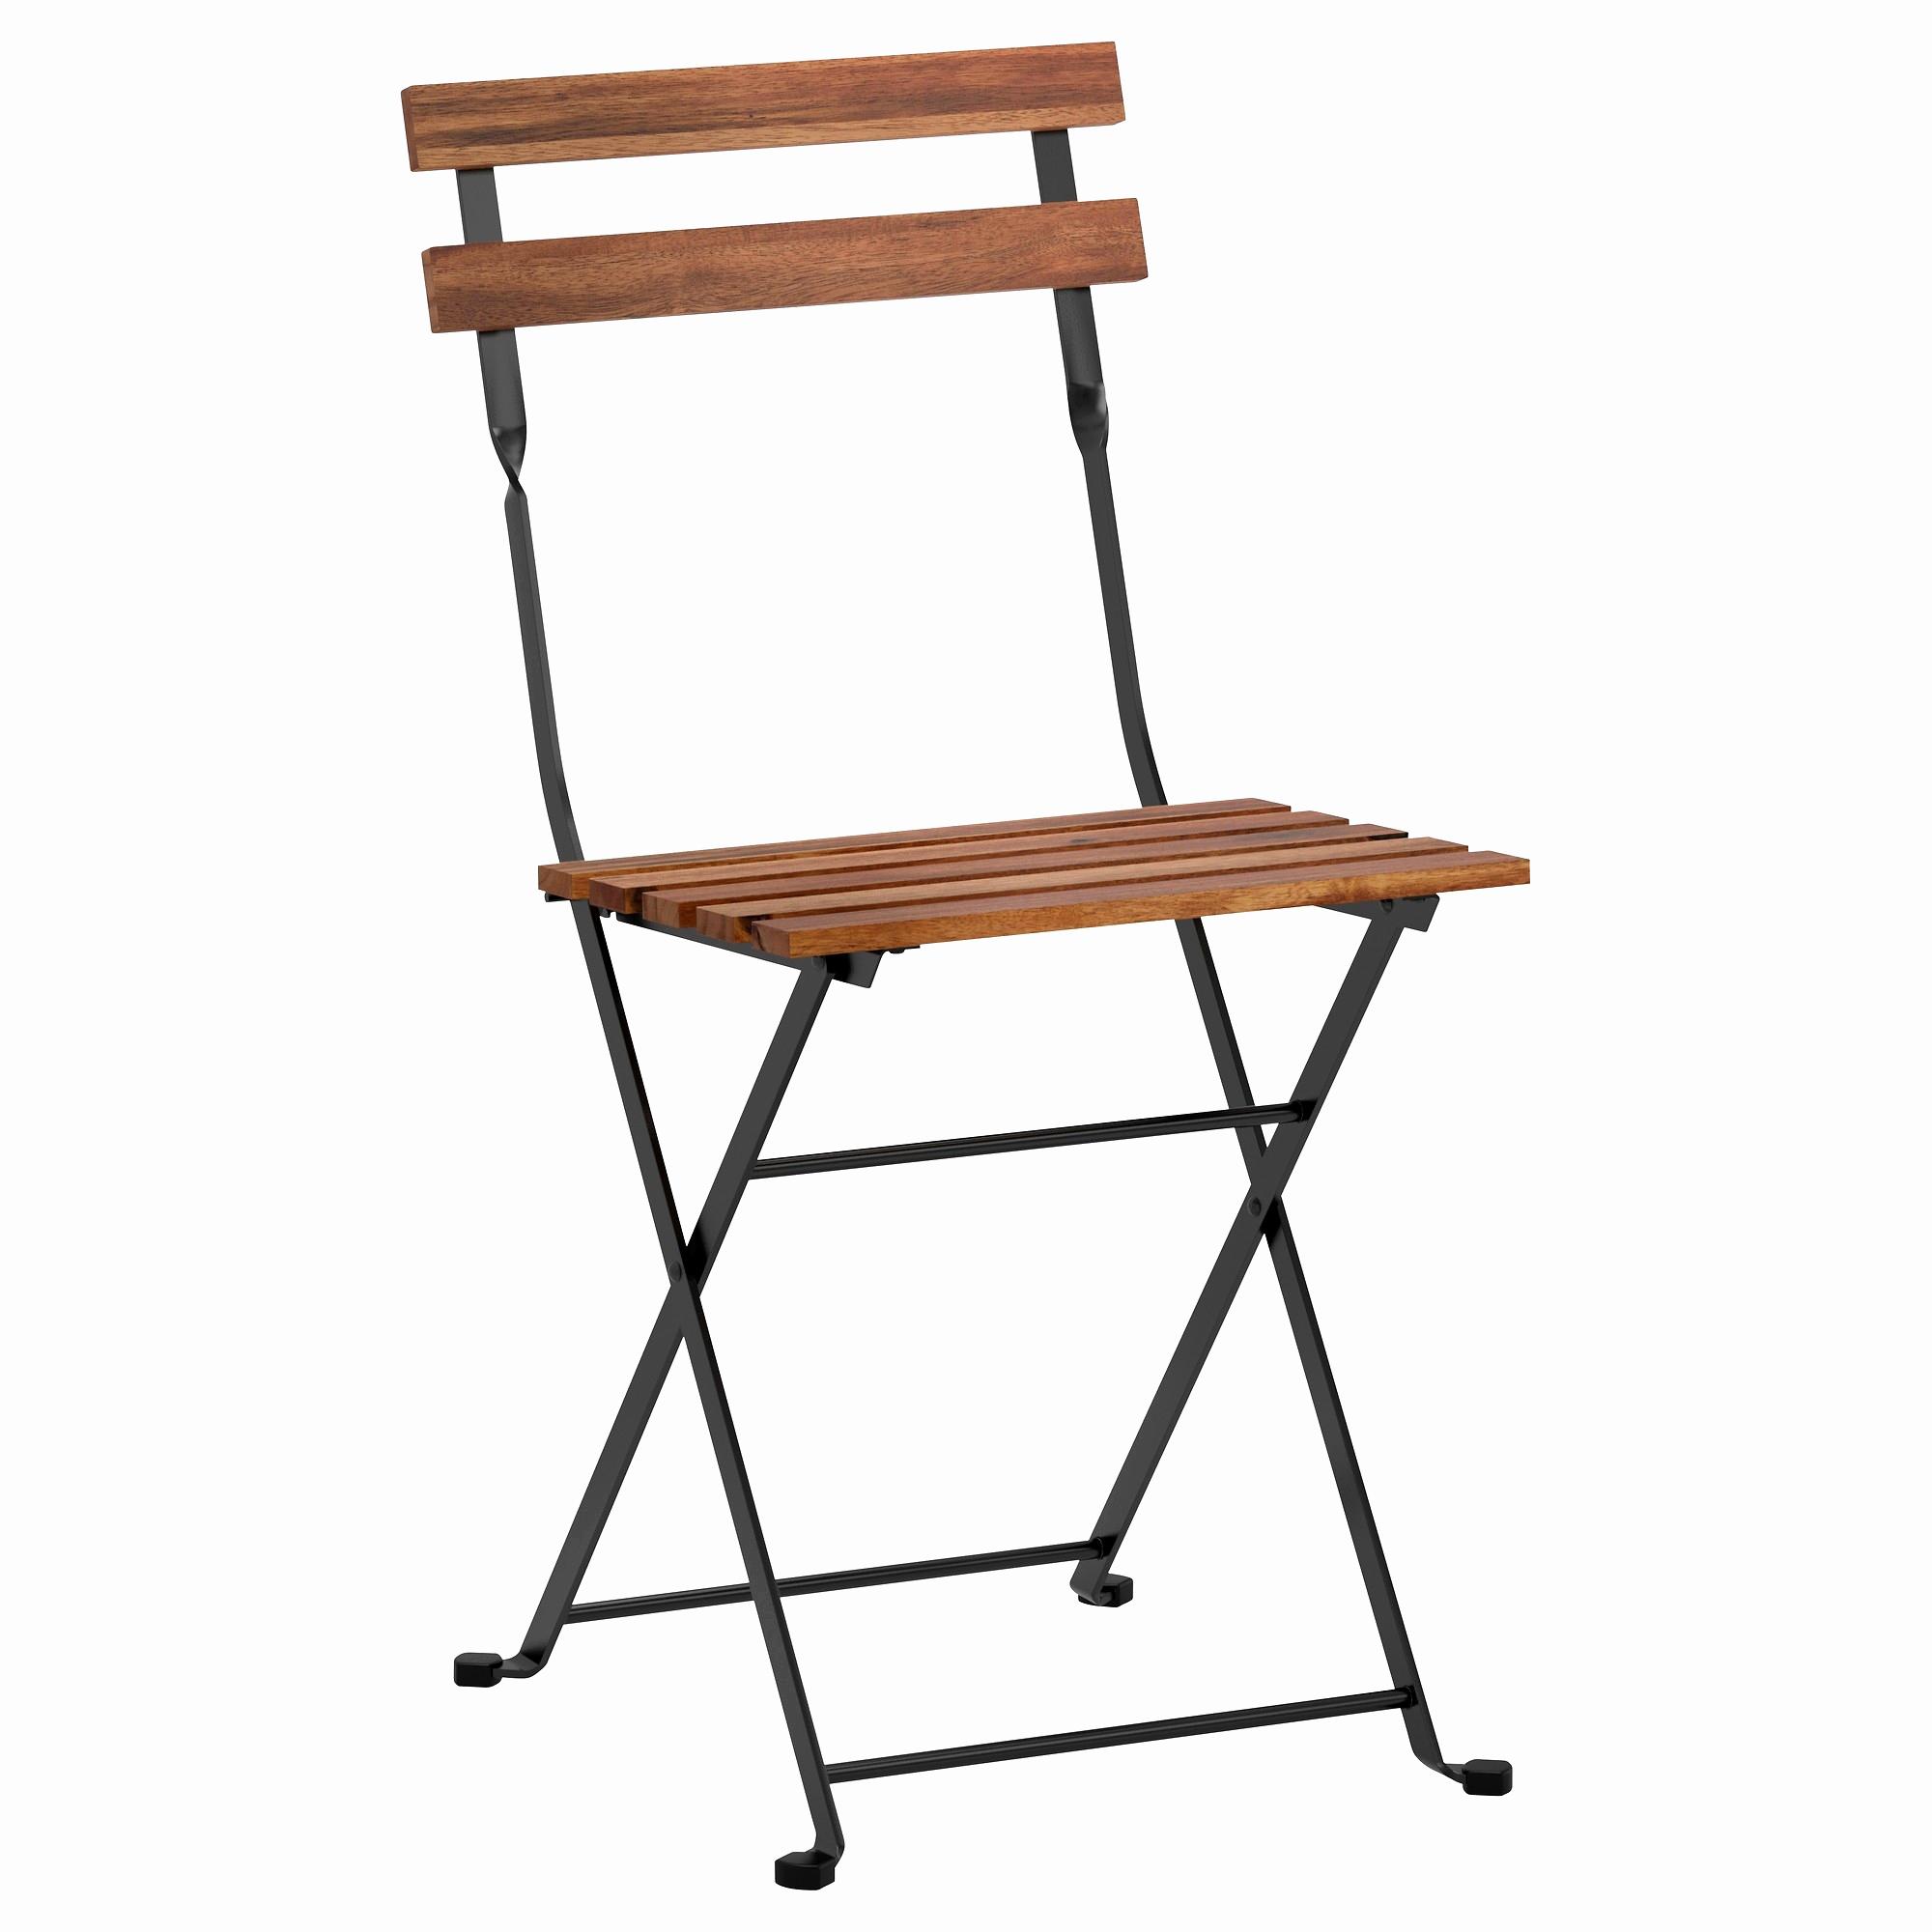 Chaises De Jardin Ikea Beau Photos 36 Meilleur De Galerie De Table Et Chaise De Jardin Ikea